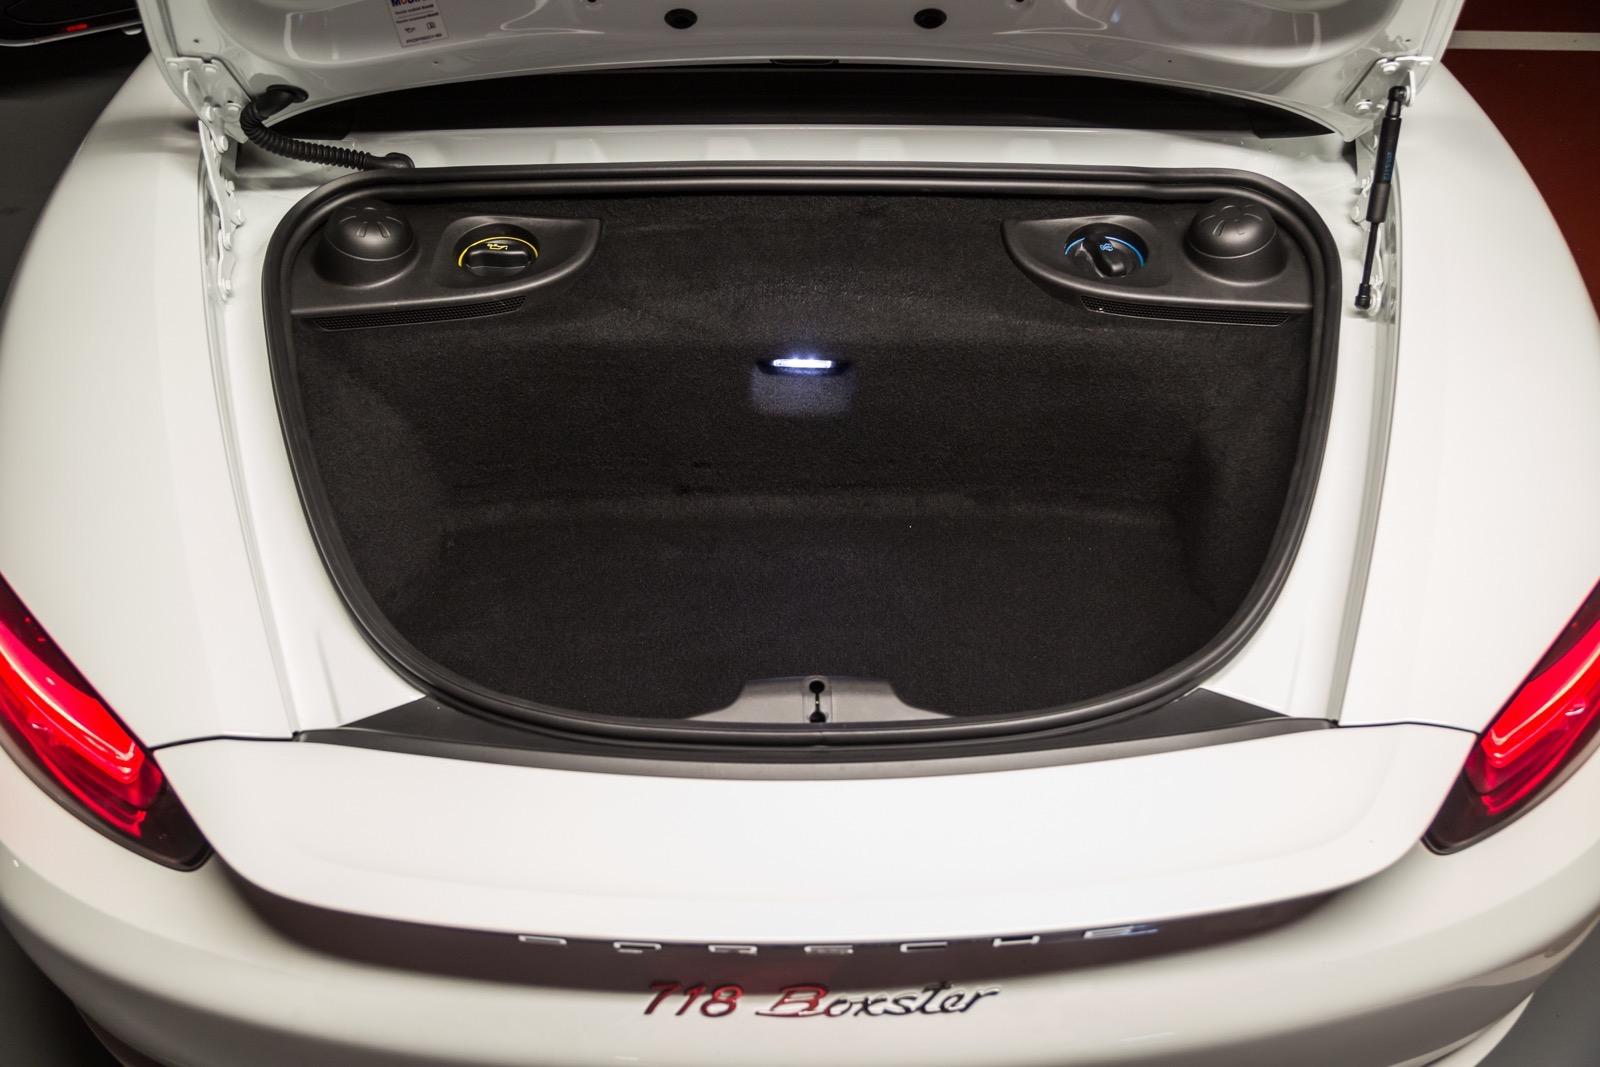 Test_Drive_Porsche_718_Boxster_81